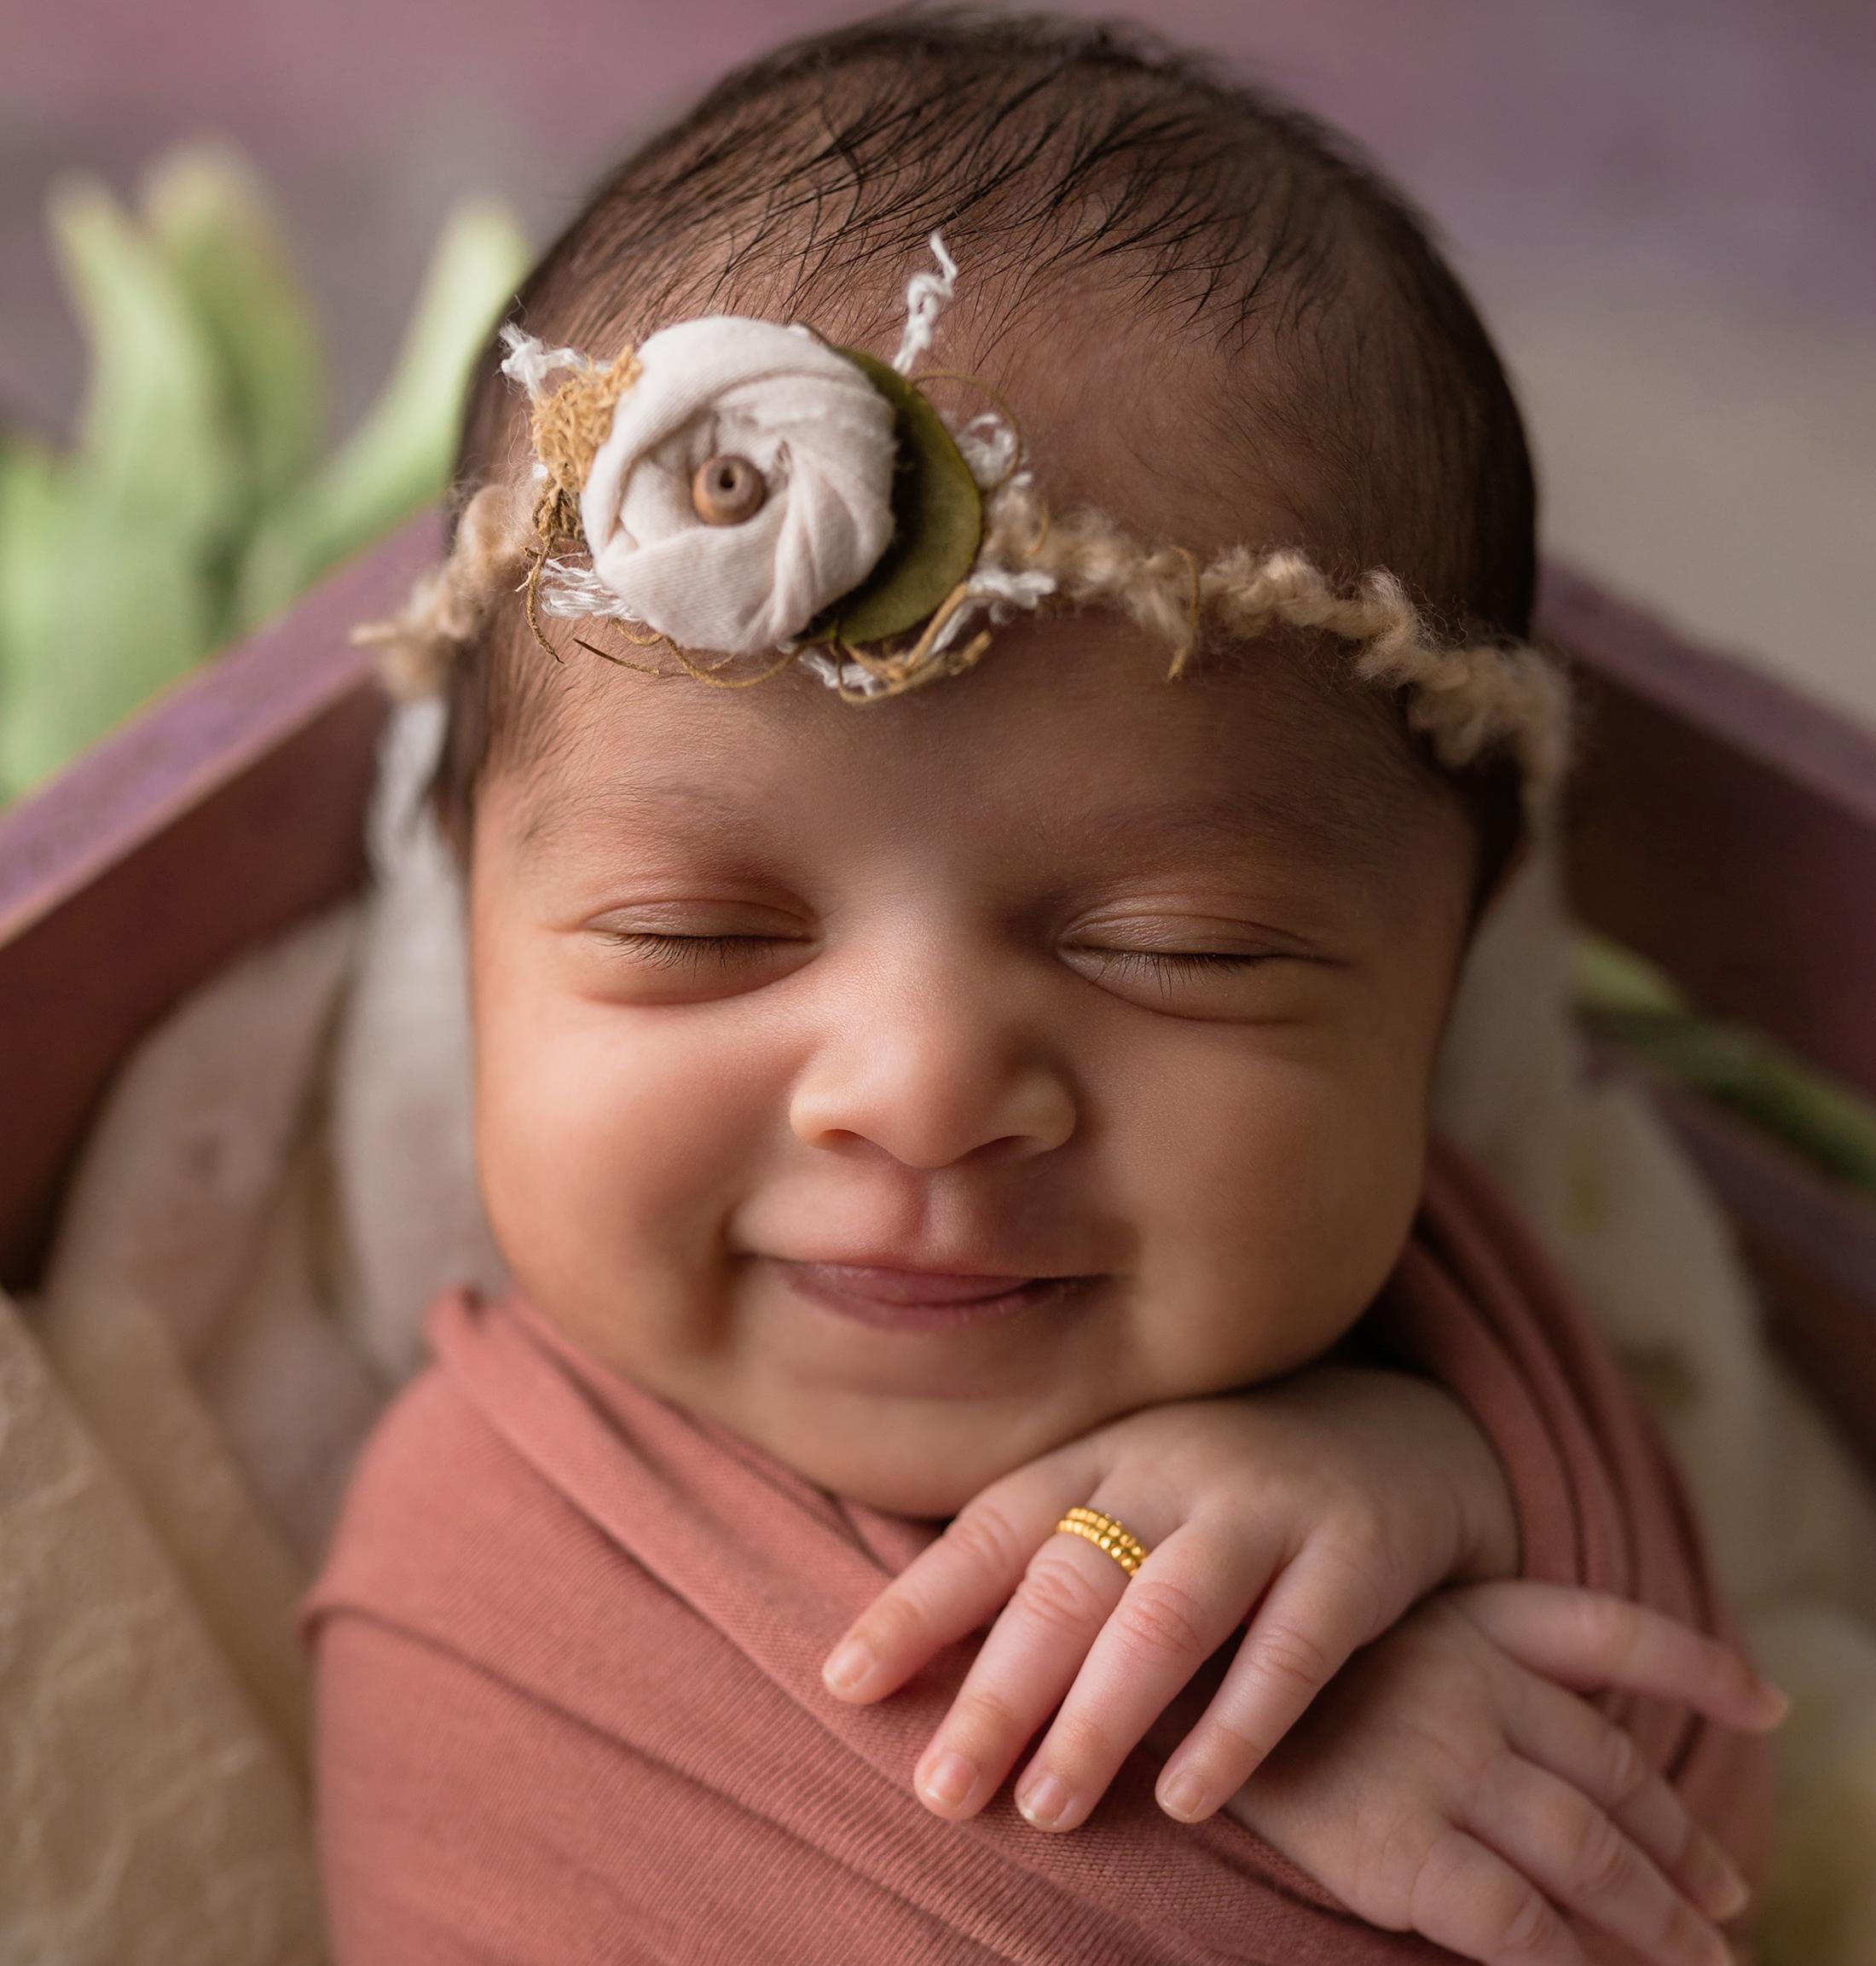 baby girl smile